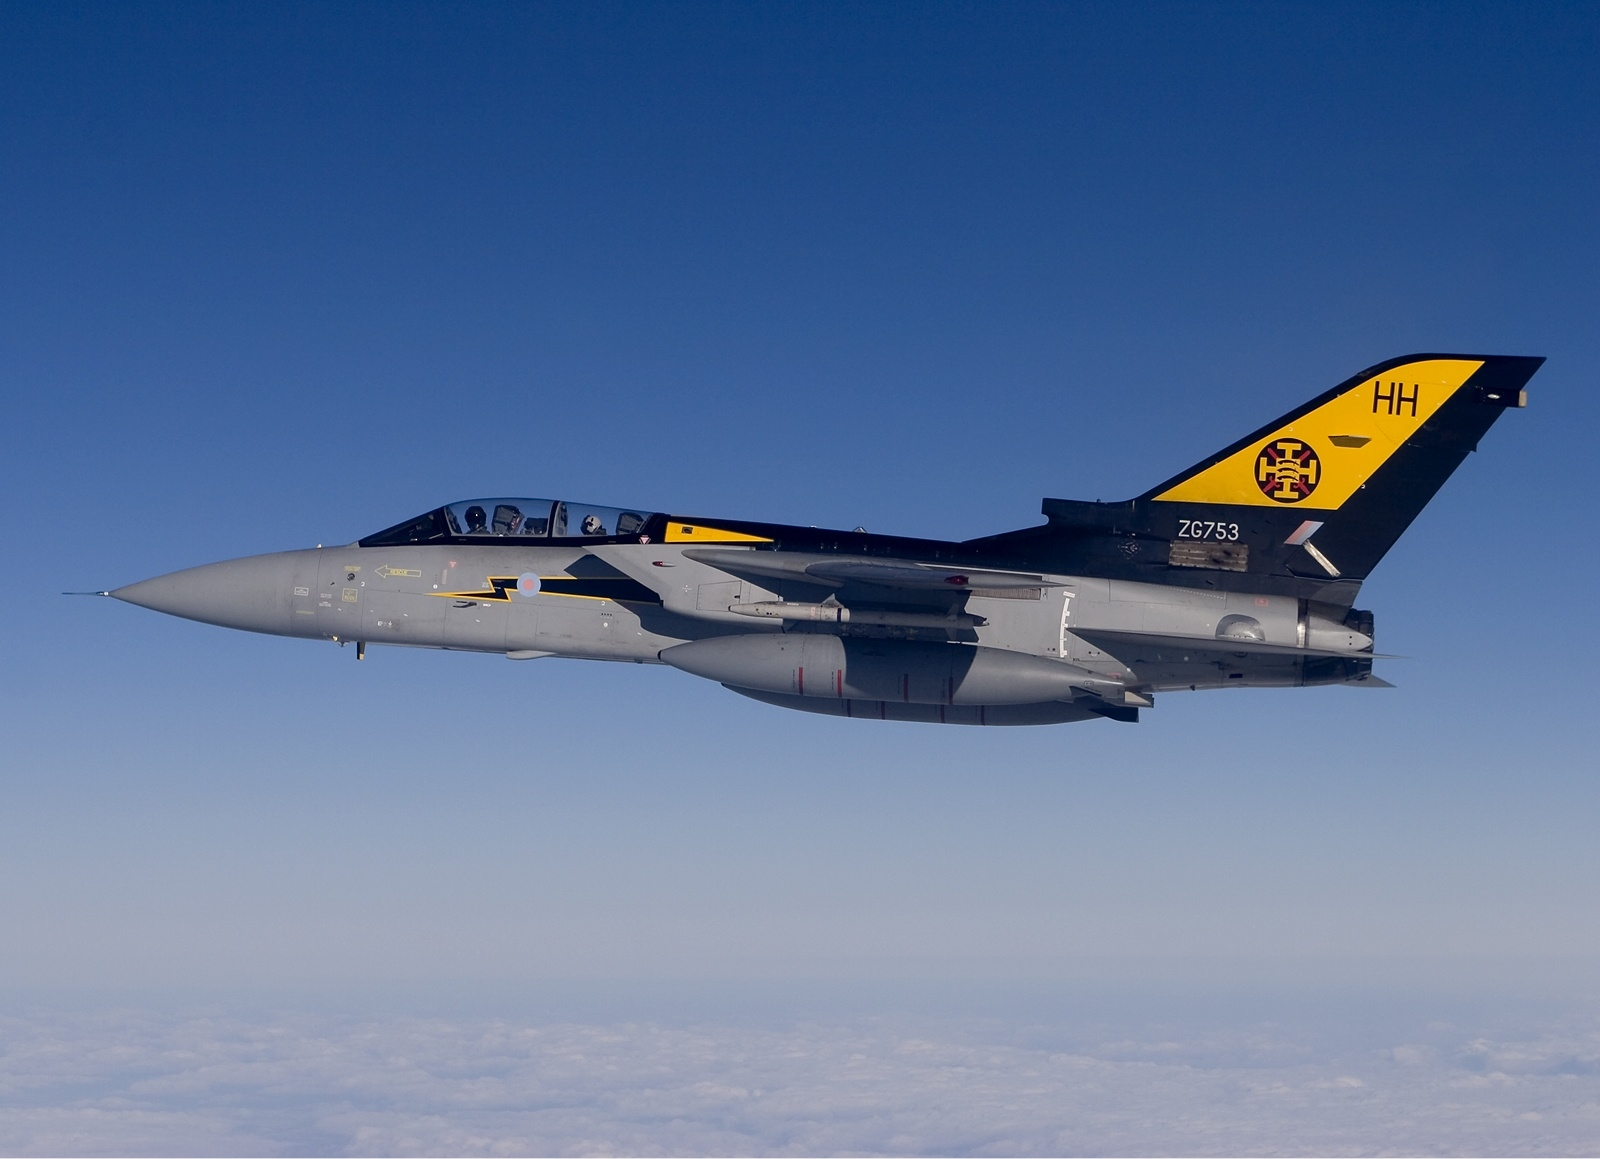 Royal Air Force Panavia Tornado F3 Lofting-3.jpg